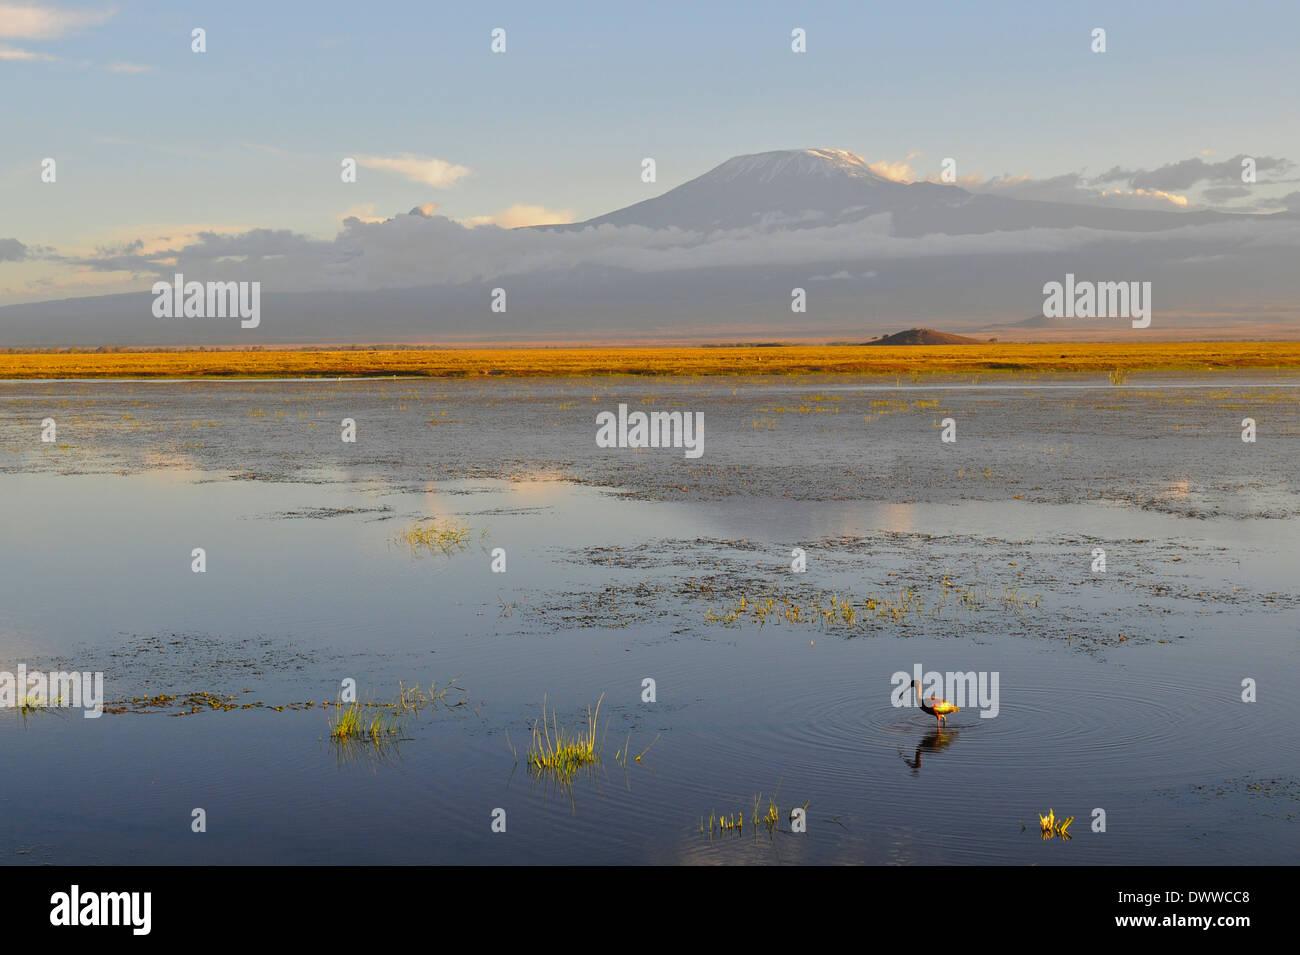 Glossy Ibis (Plegadis falcinellus) alone on lake with Kilimanjaro in background. Amboseli National Park. Kenya - Stock Image